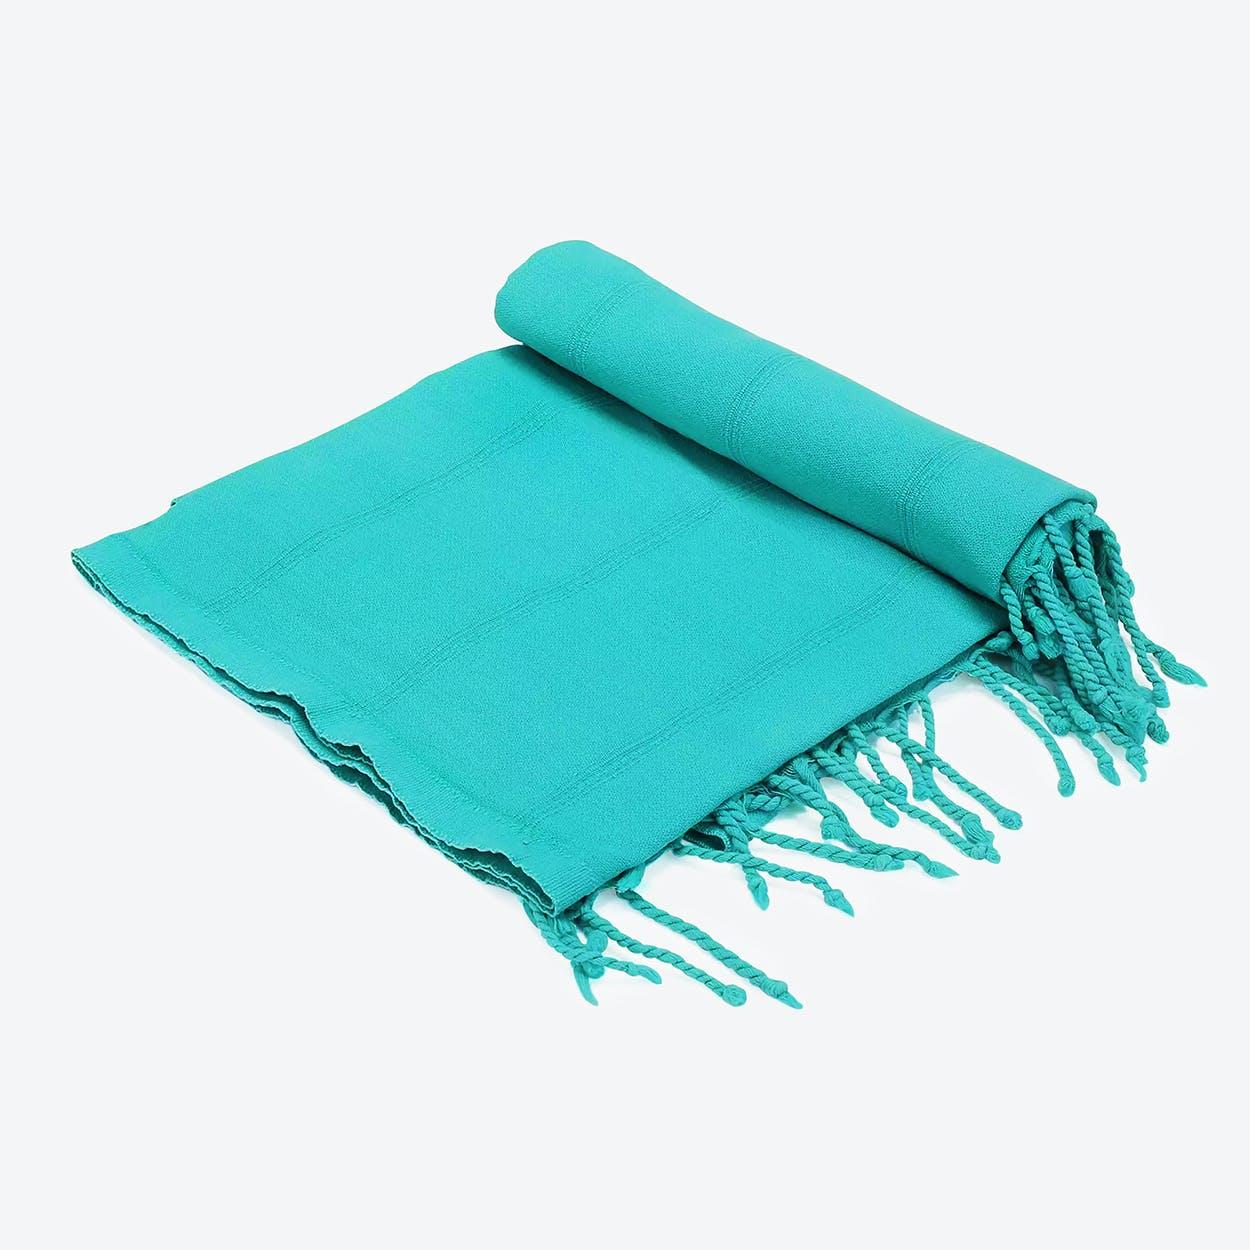 Levi Beach Towel in Navy-Blue